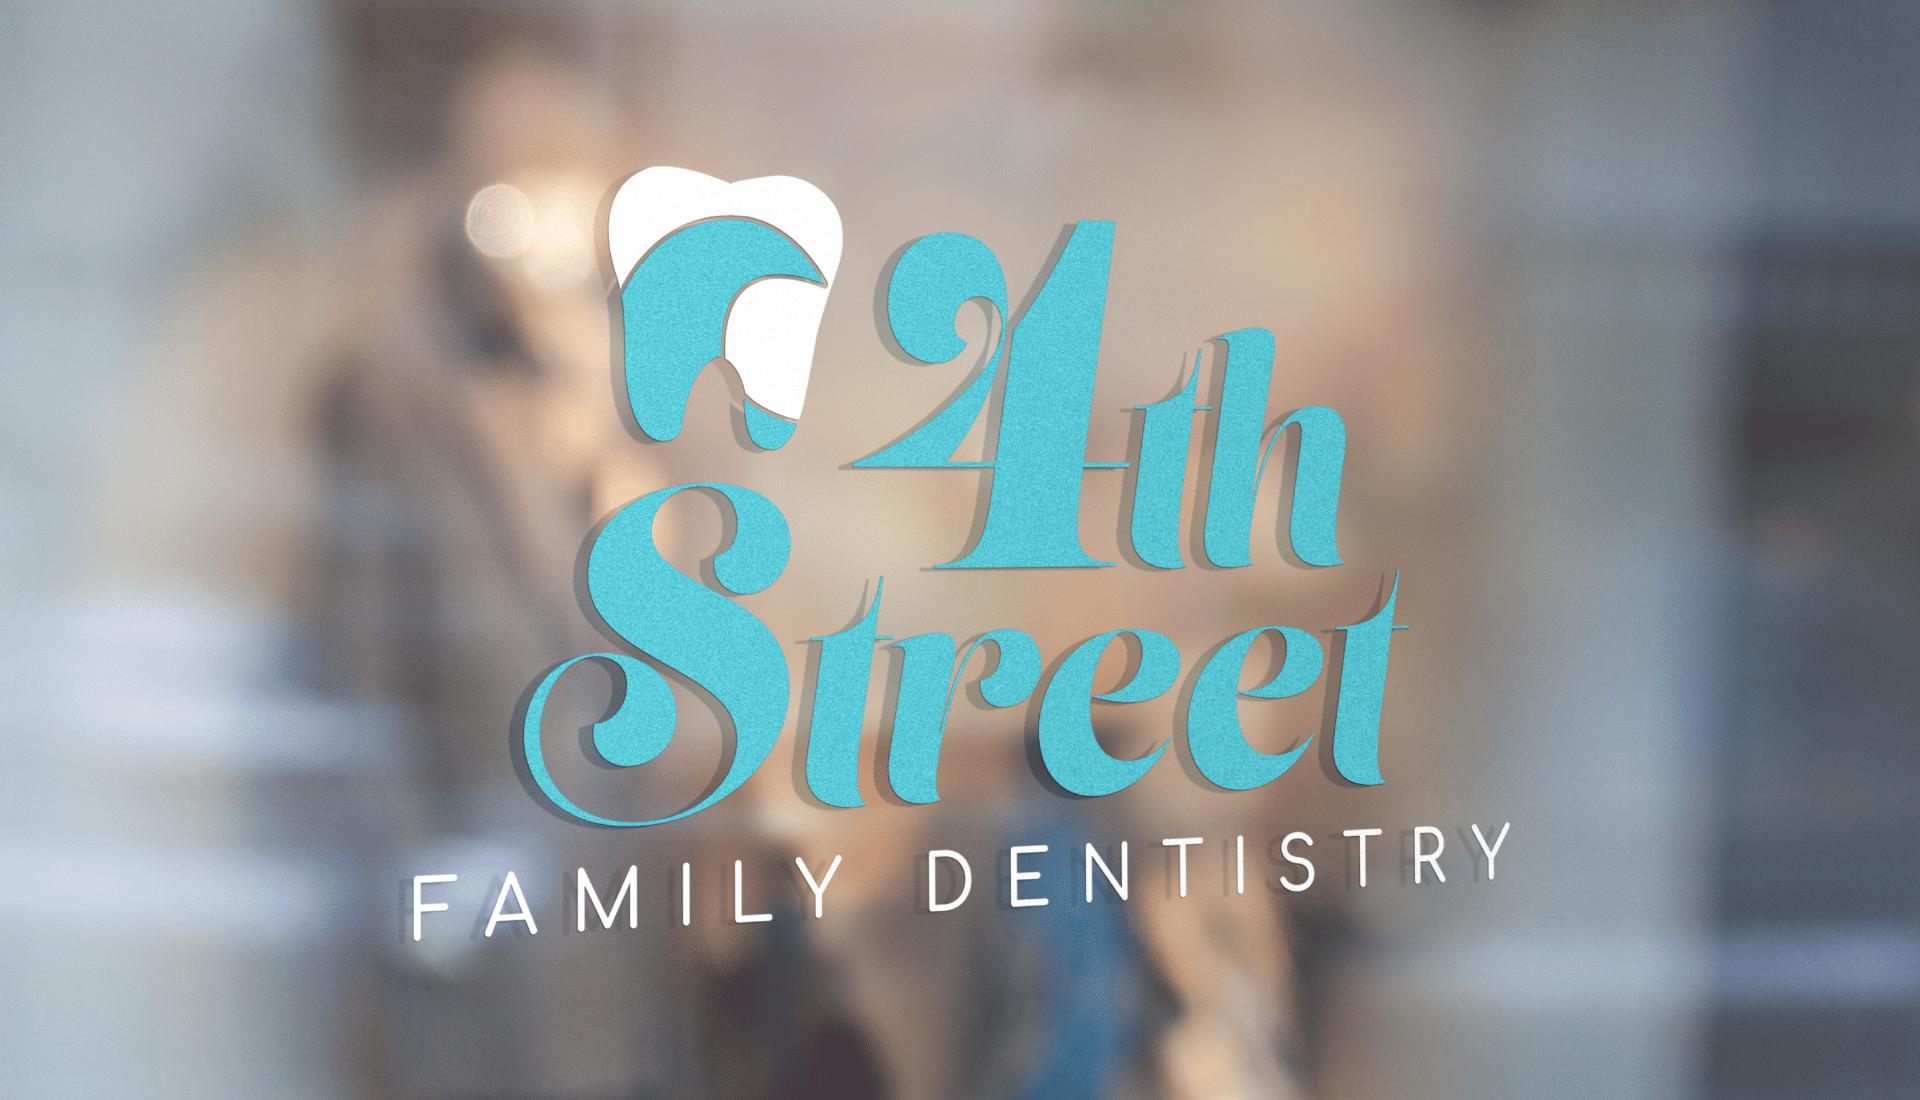 4th street family dentistry logos